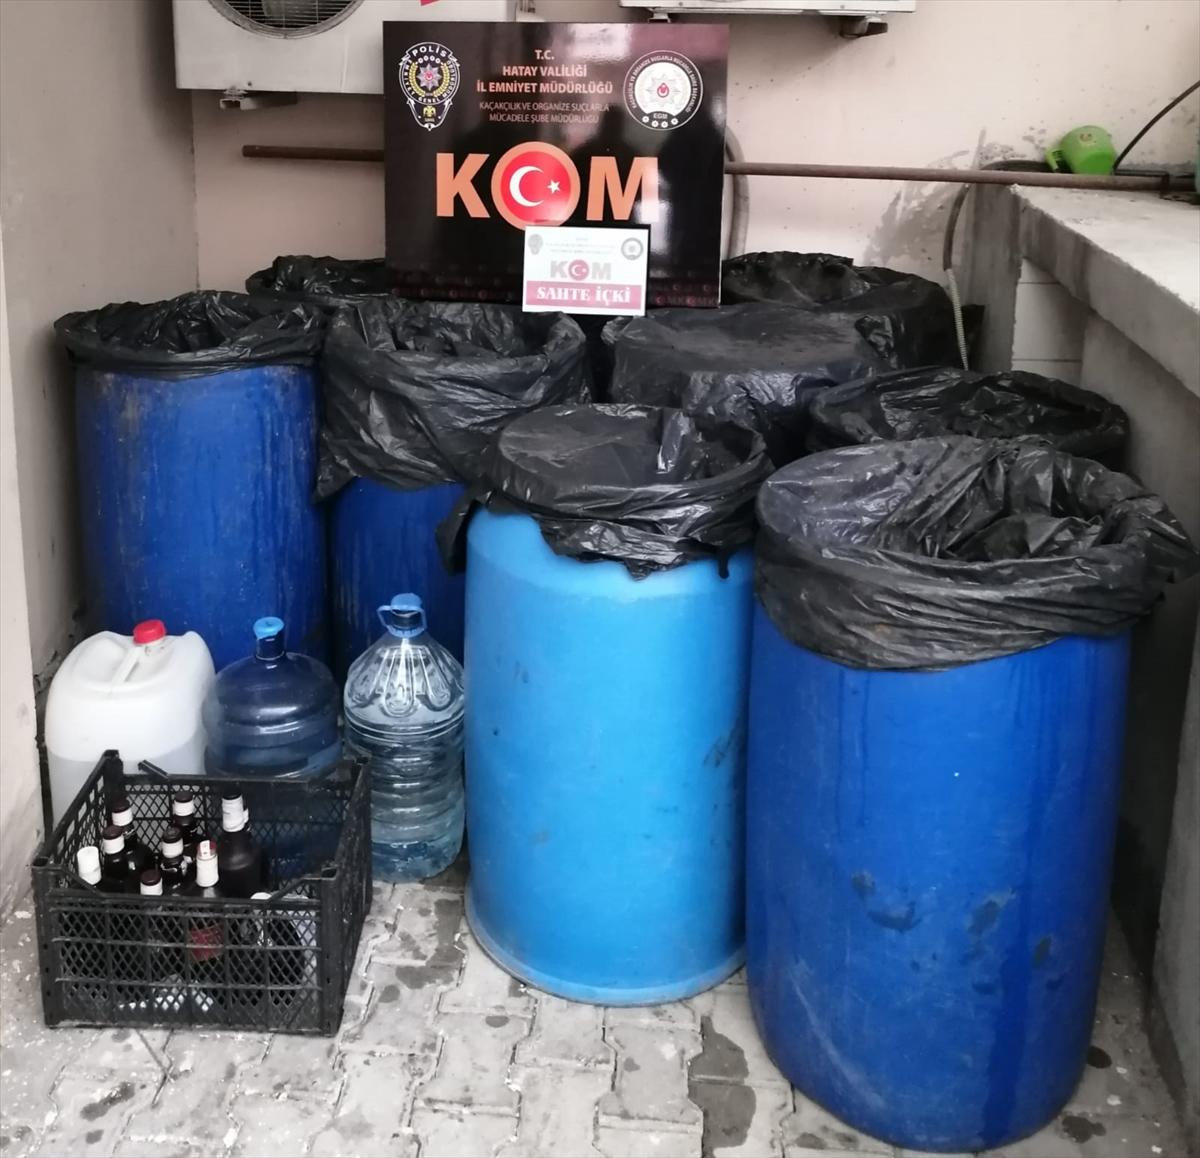 Hatay'da 308 litre sahte içki ele geçirildi